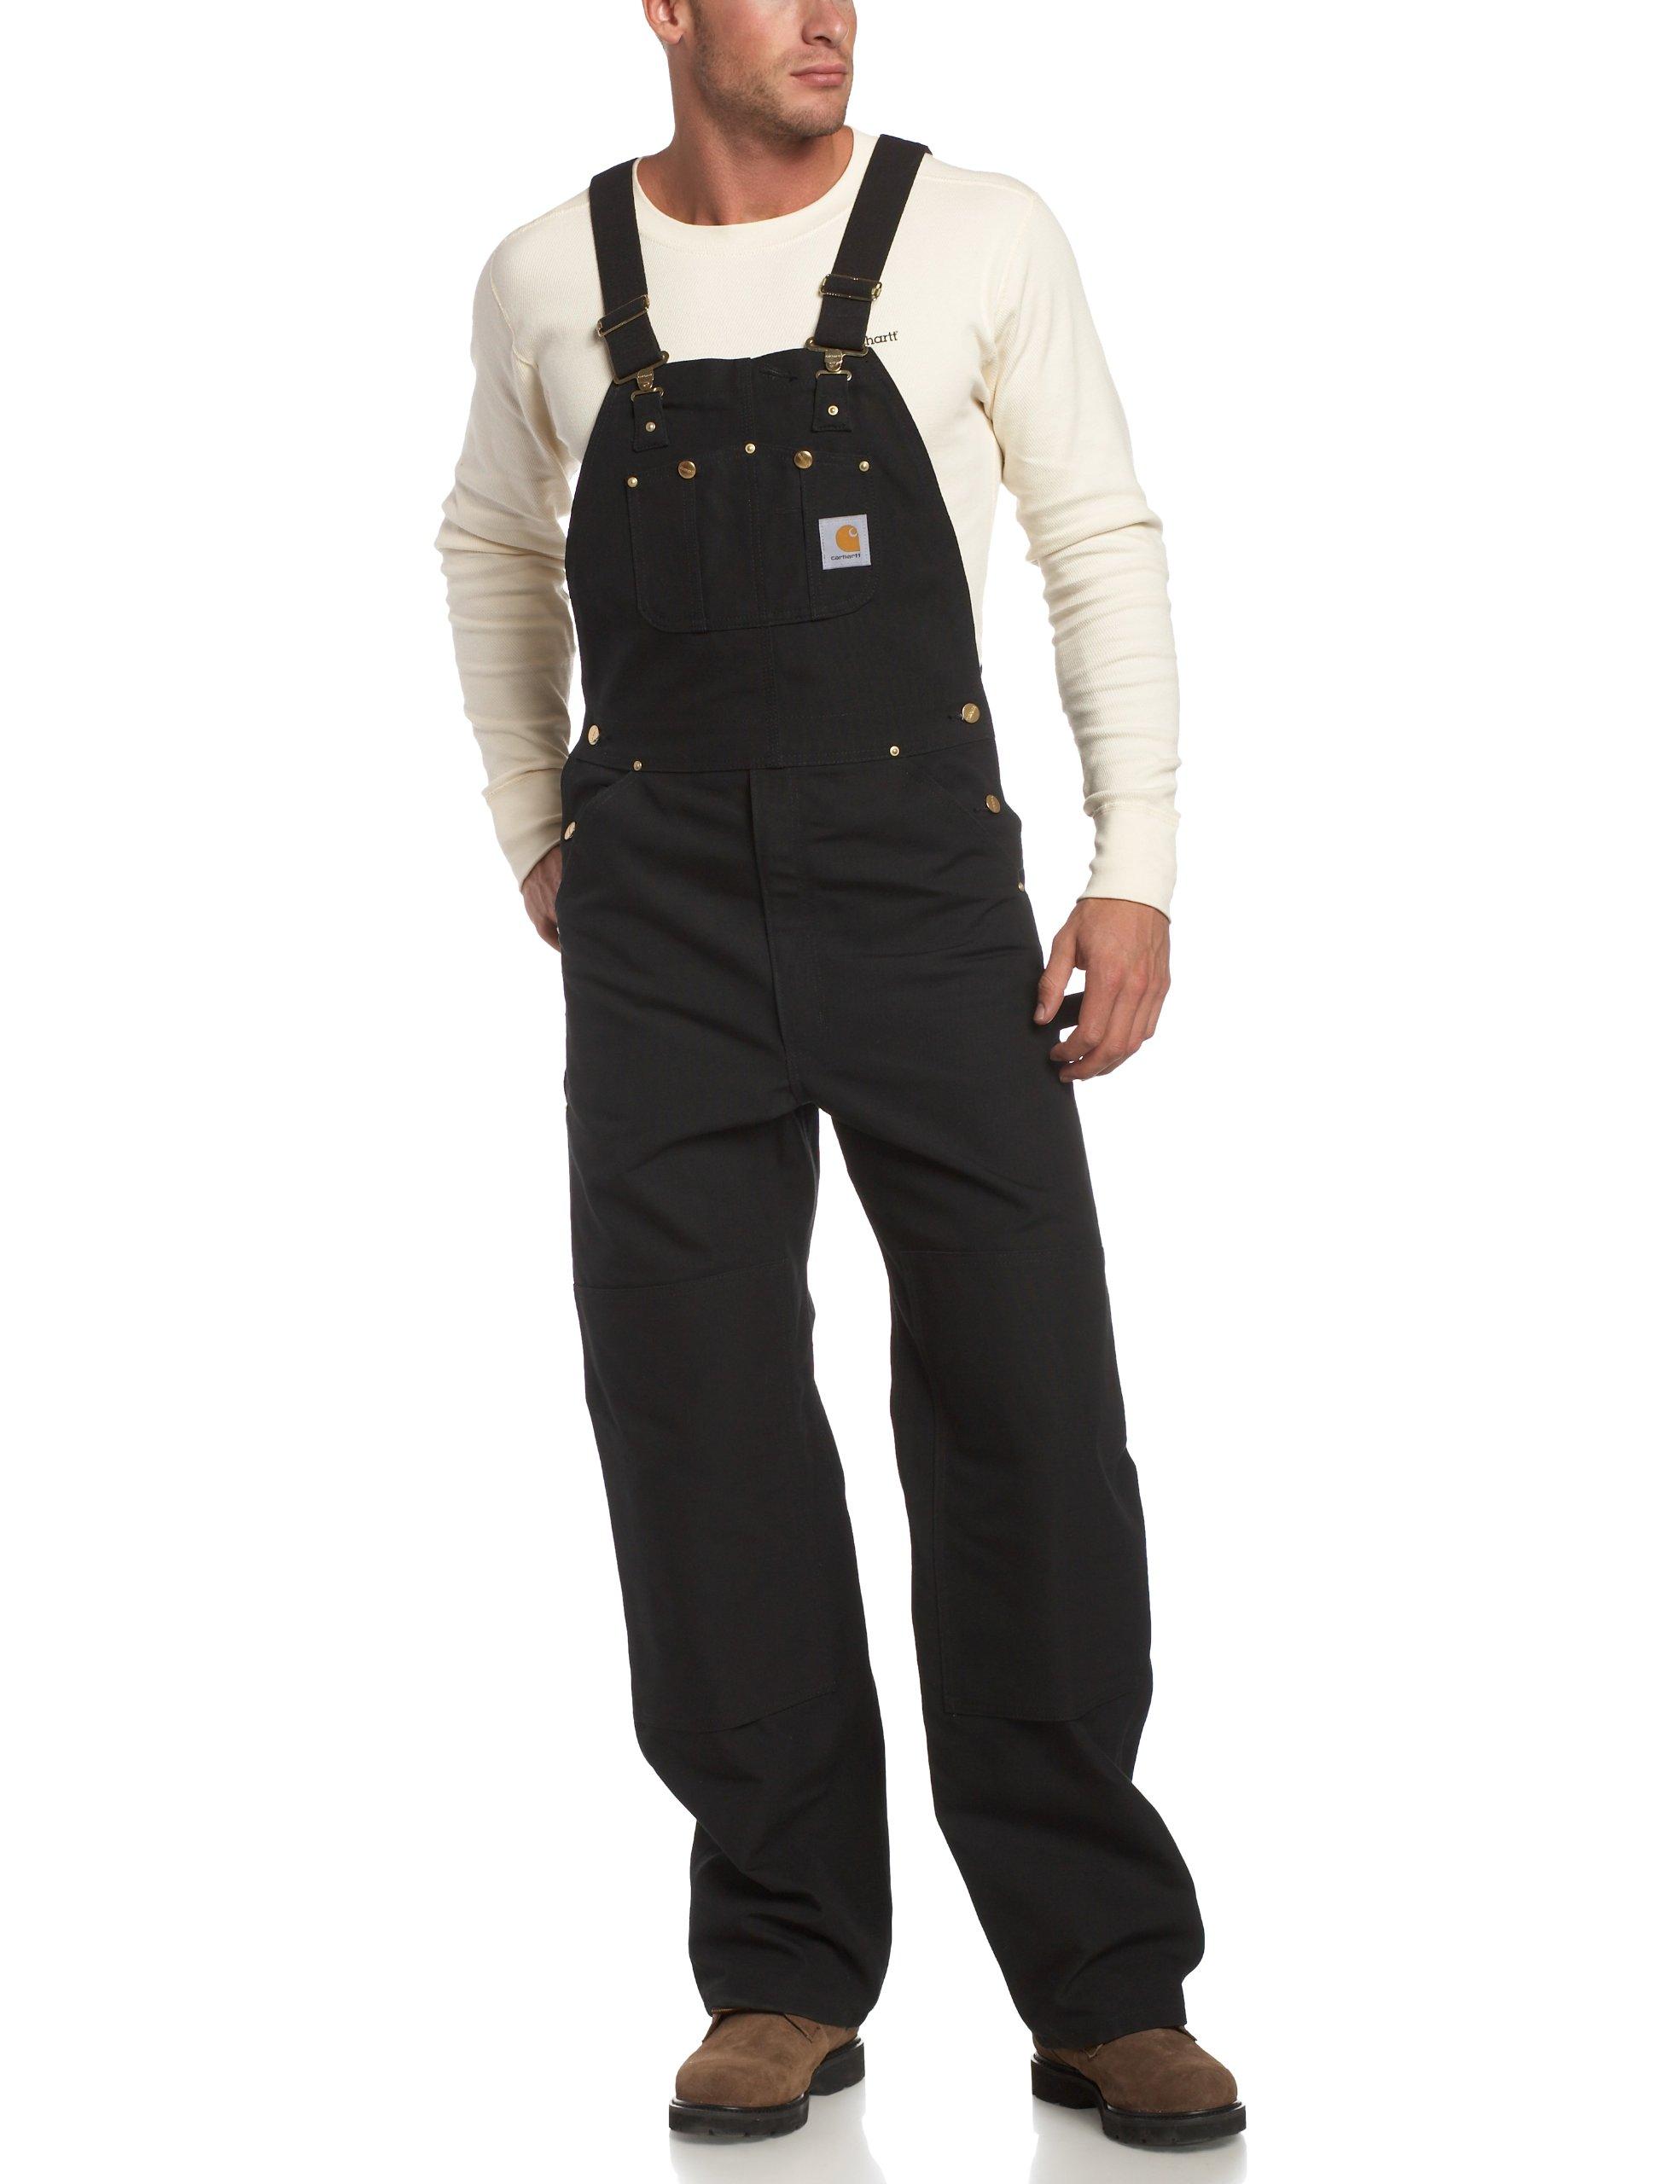 Carhartt Men's Duck Bib Overall Unlined R01,Black,36 x 30